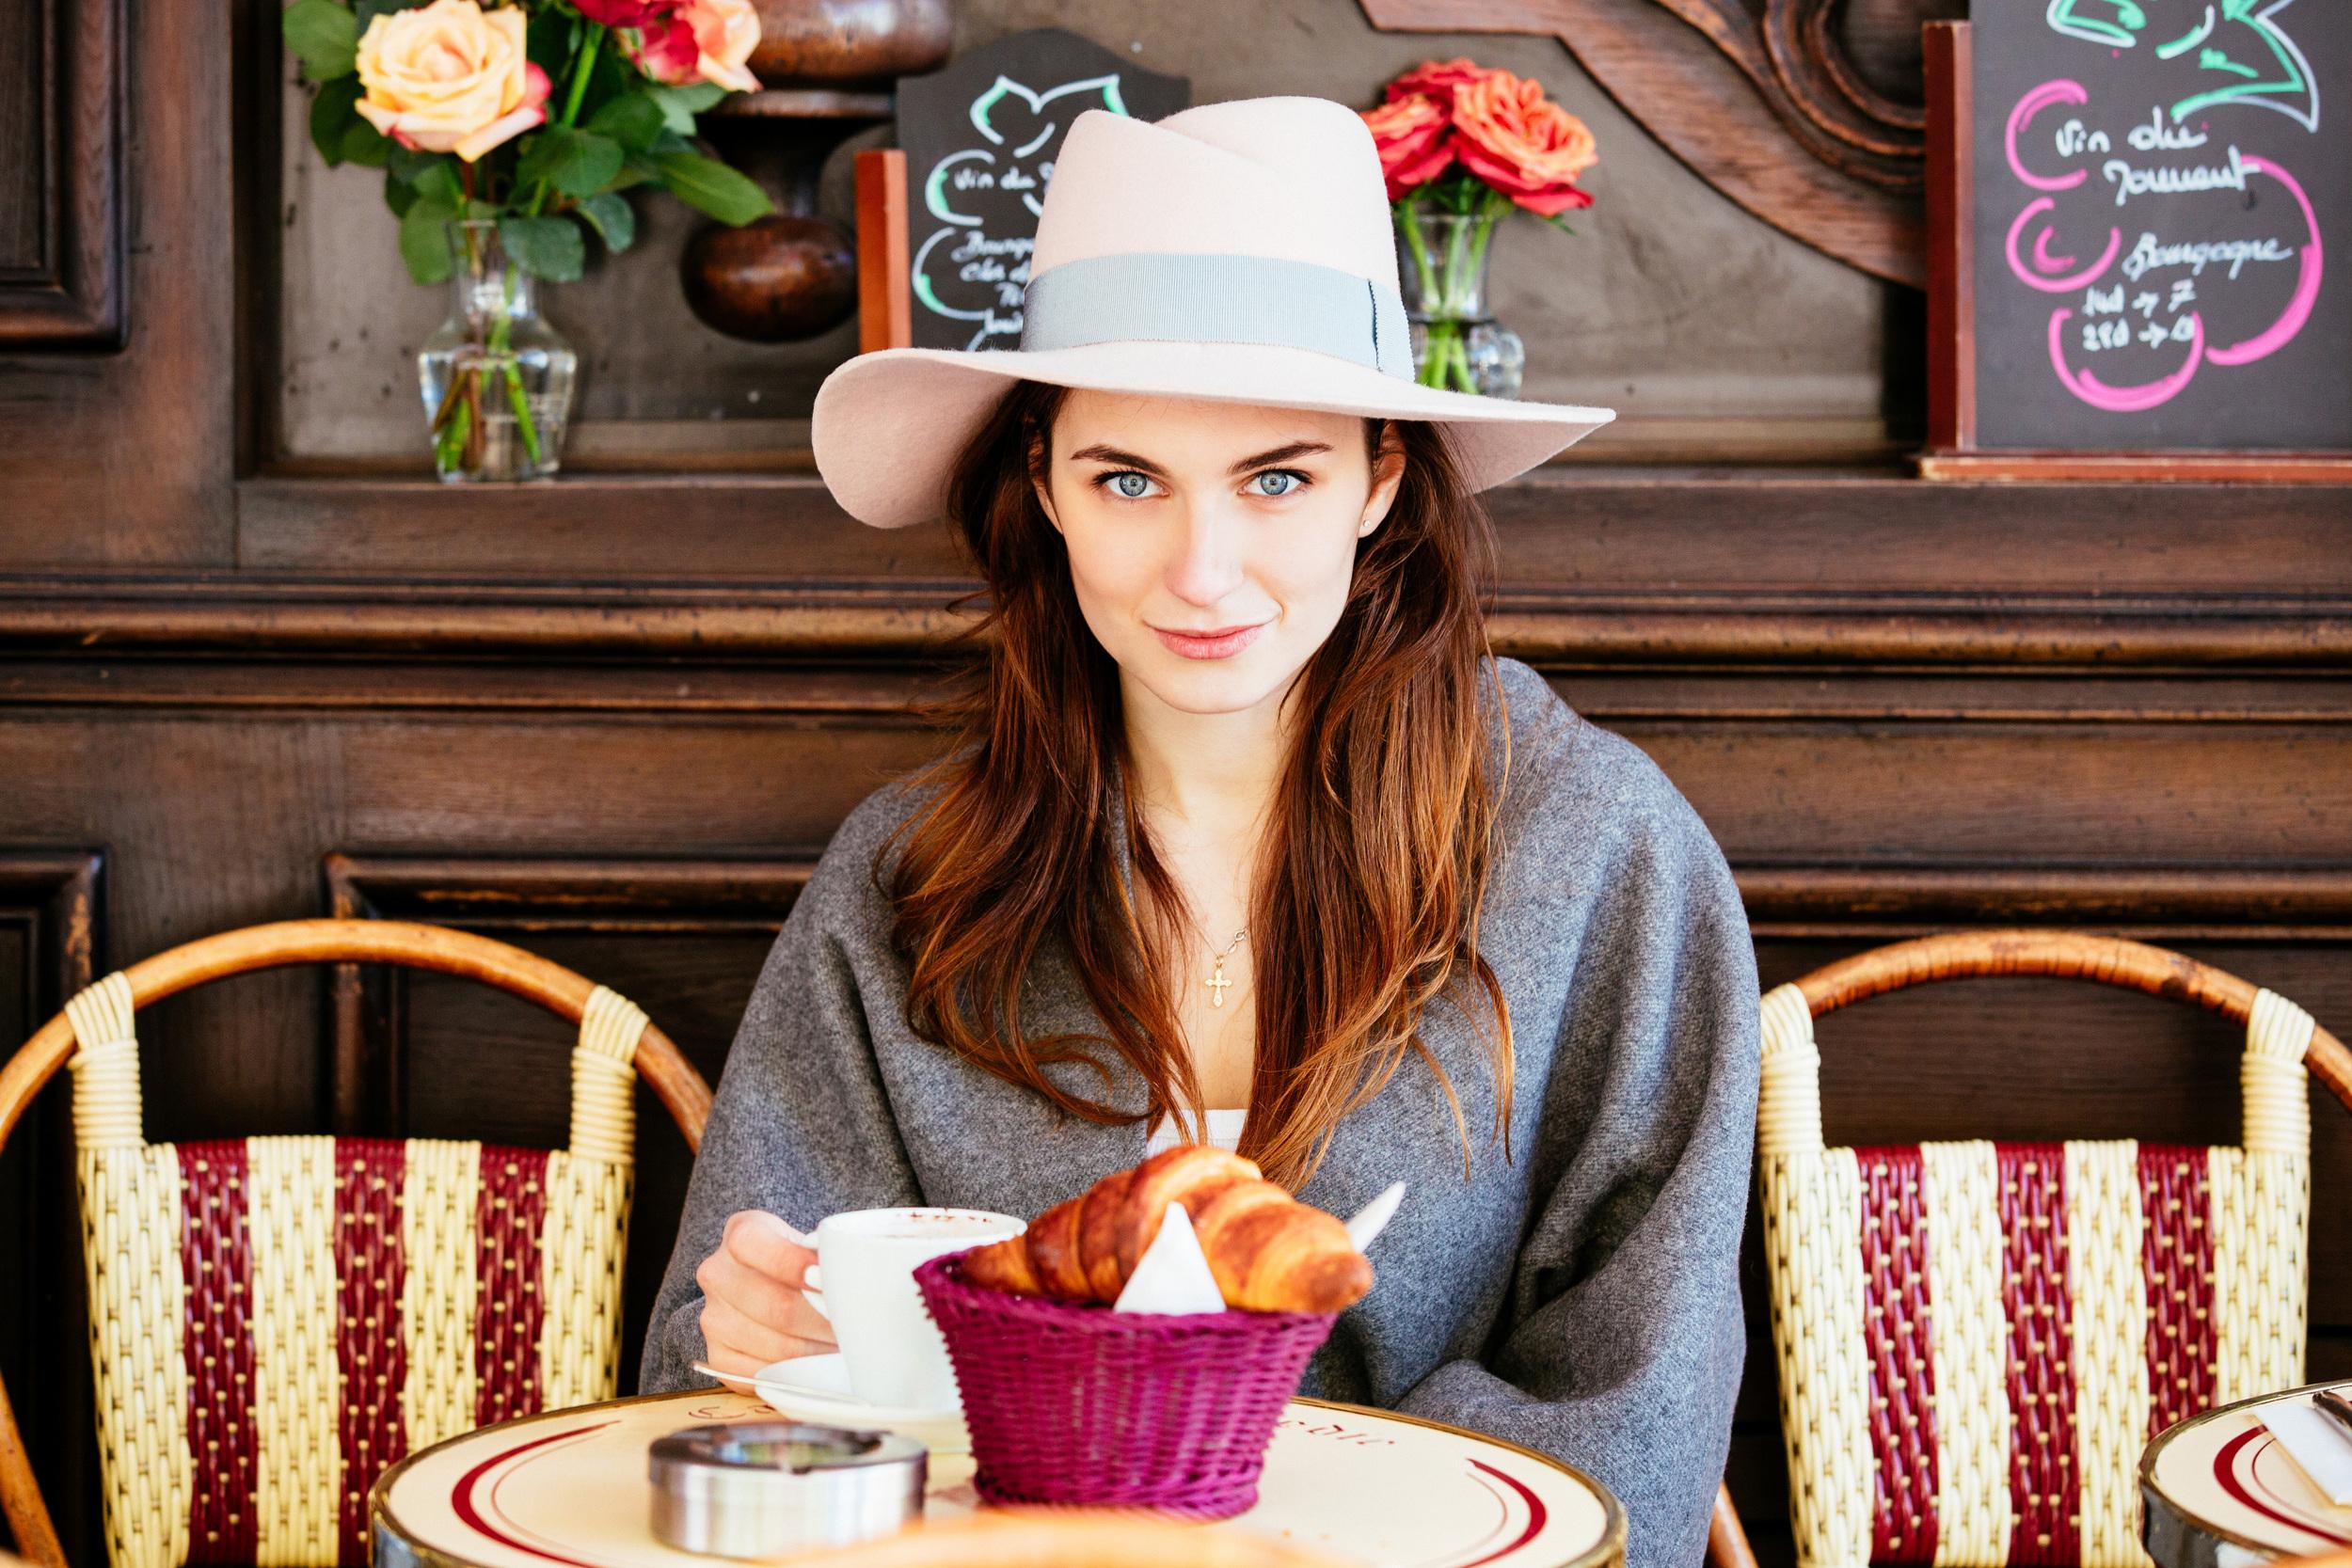 Photographer in Paris, Parisian cafe, portrait, Brand, Lookbook, Iheartparisfr